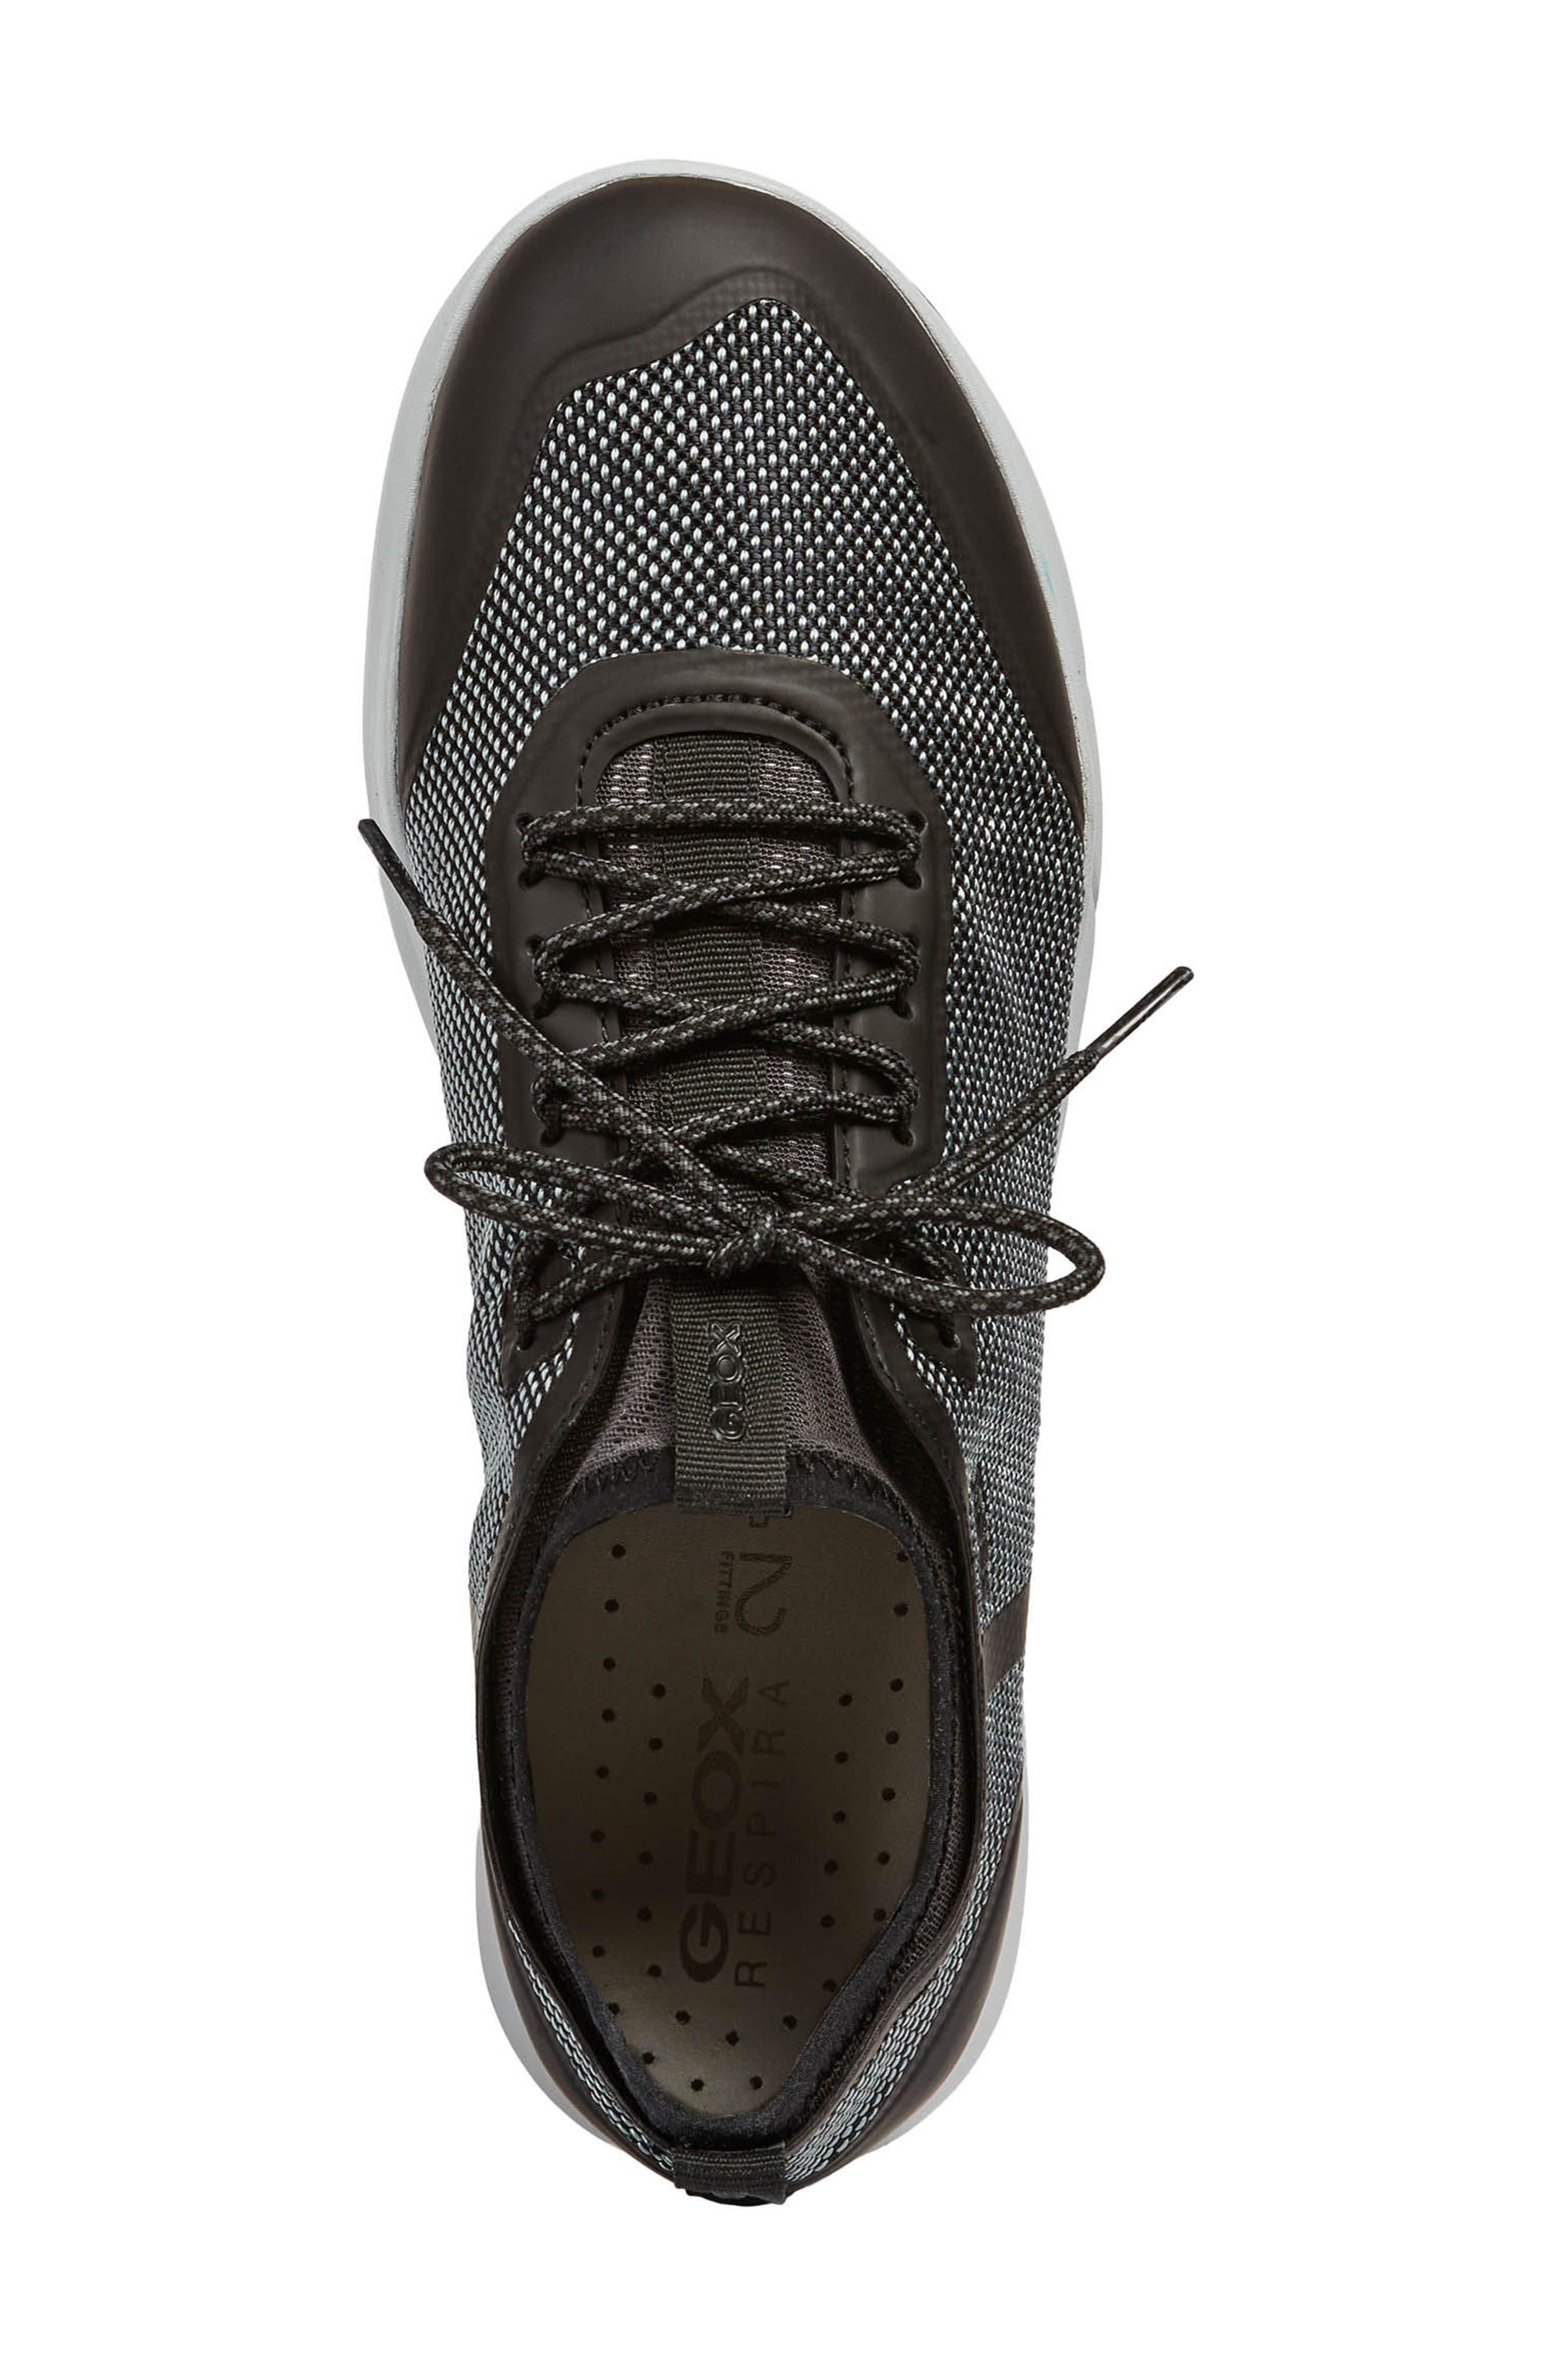 Nebula X 3 Low Top Sneaker,                             Alternate thumbnail 5, color,                             BLACK LEATHER